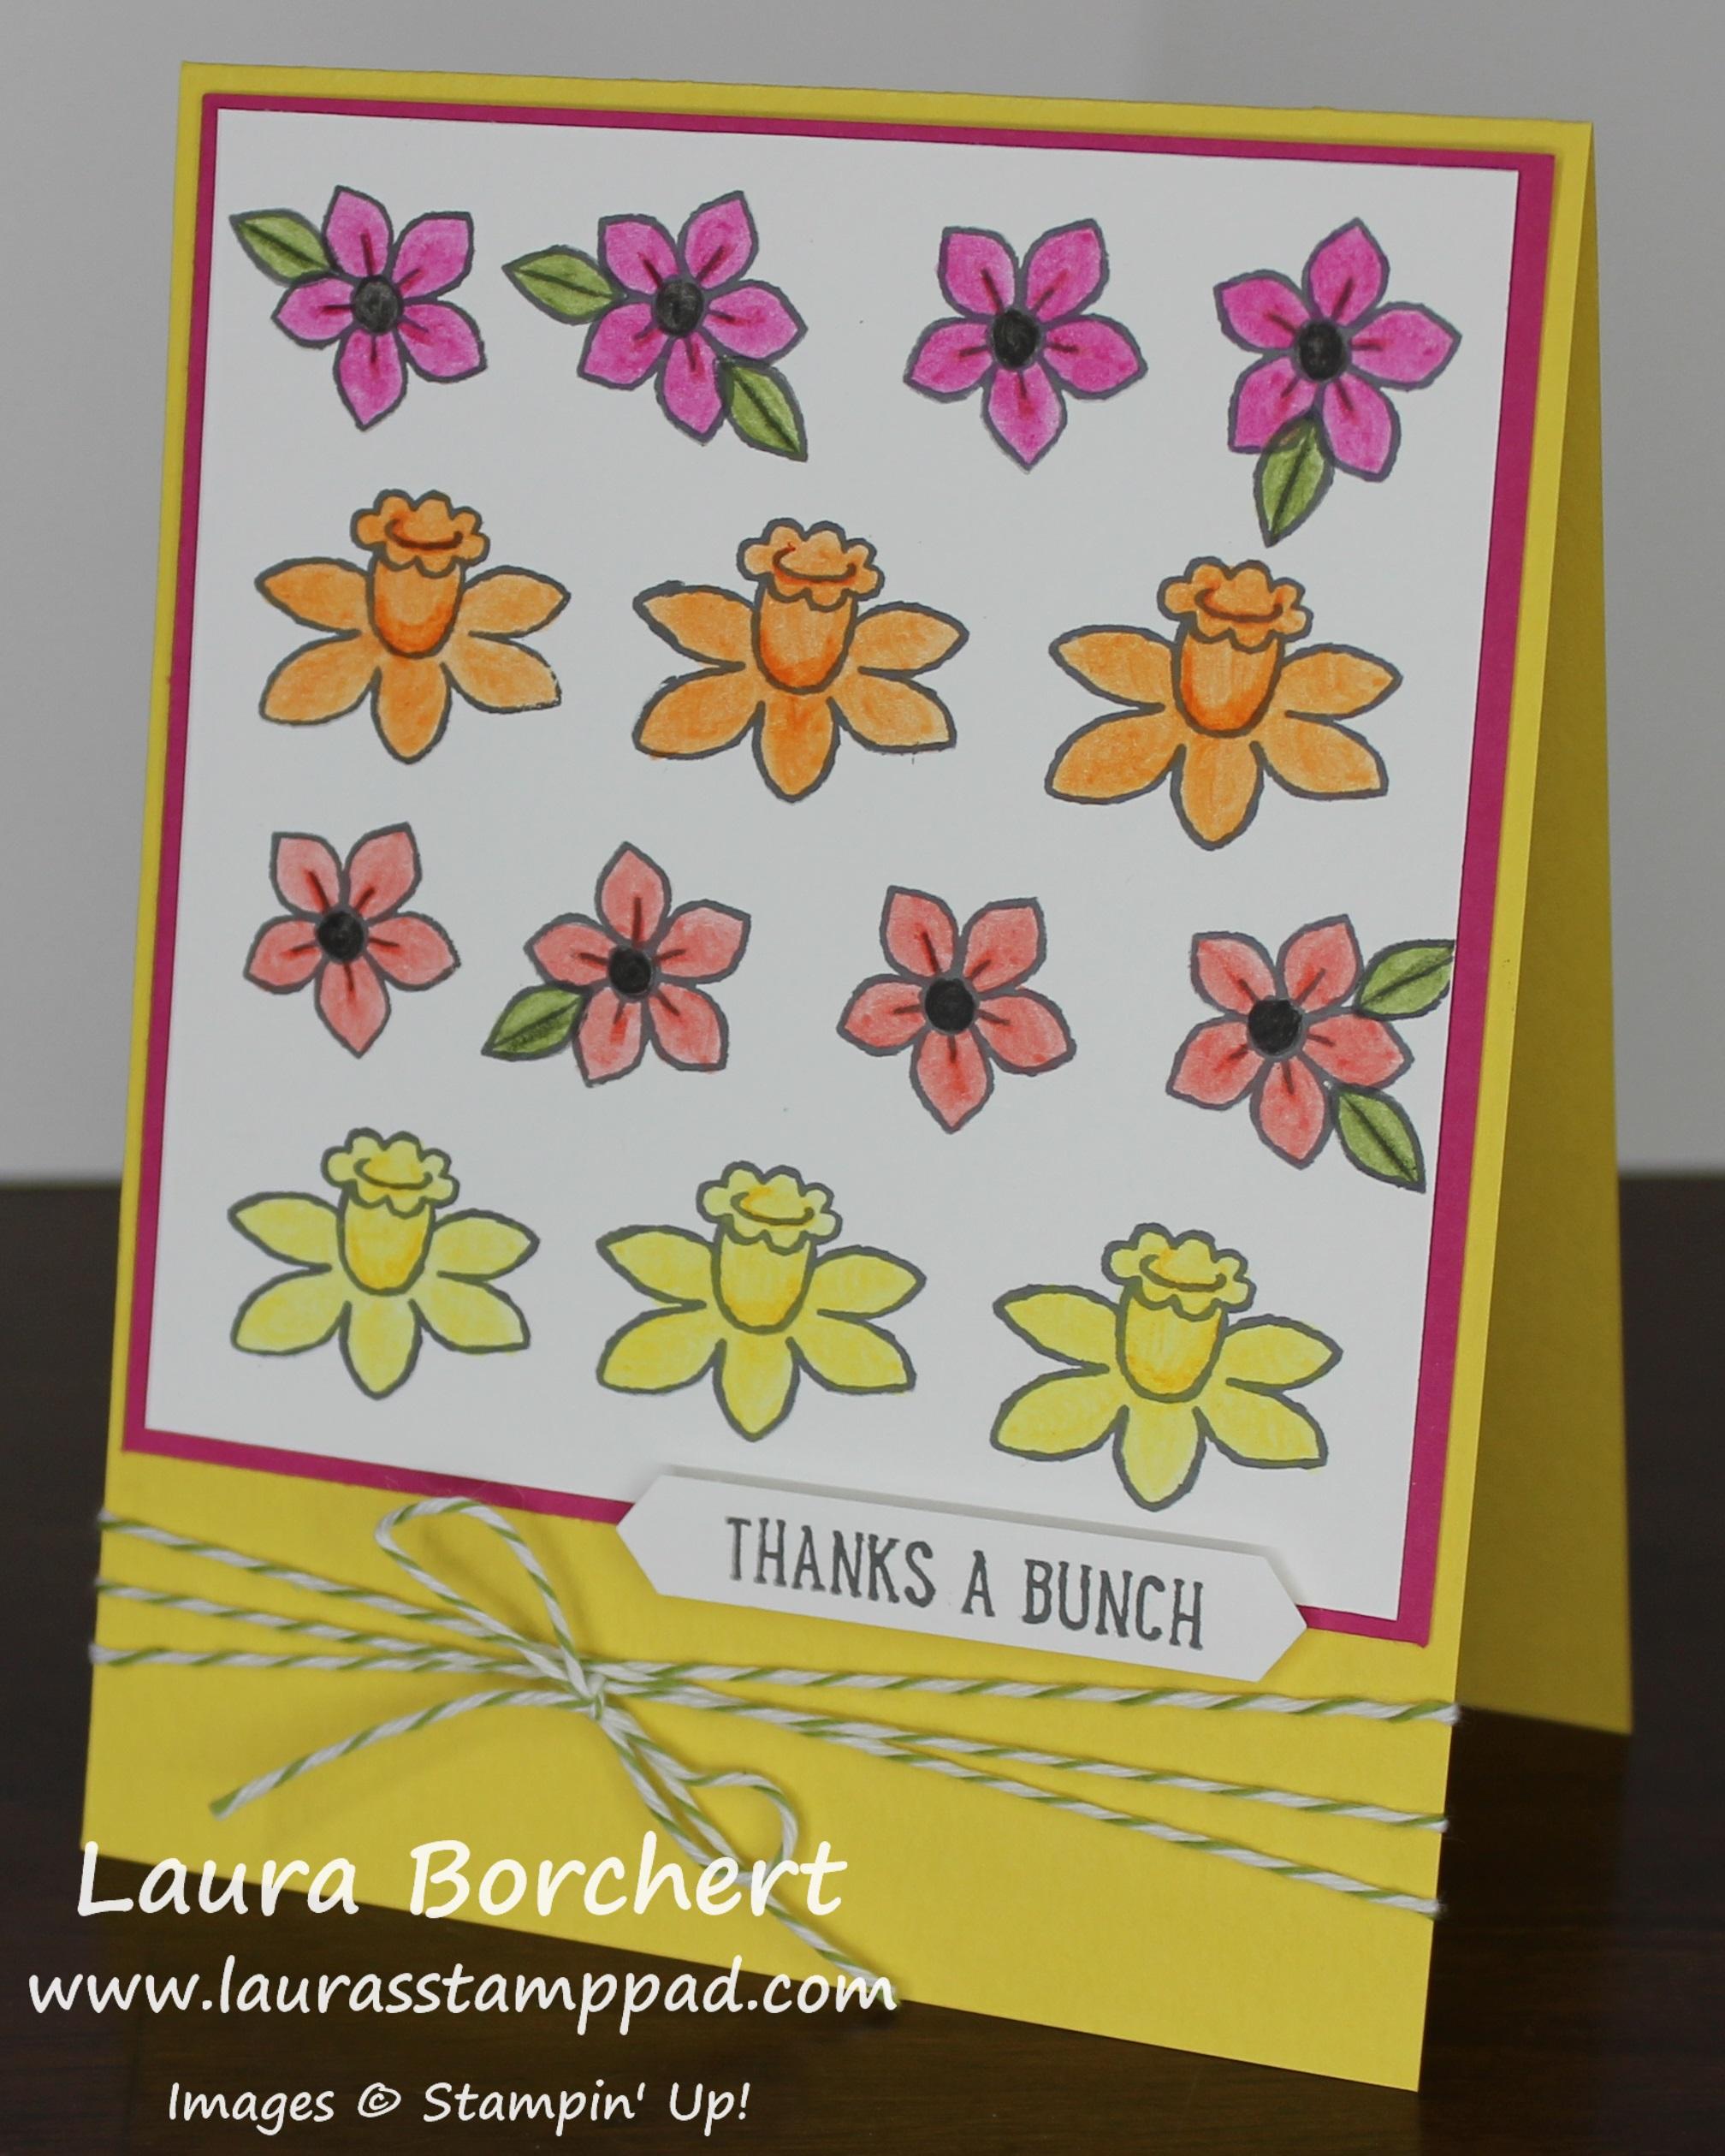 Bright Spring Flowers Laurasstamppad Lauras Stamp